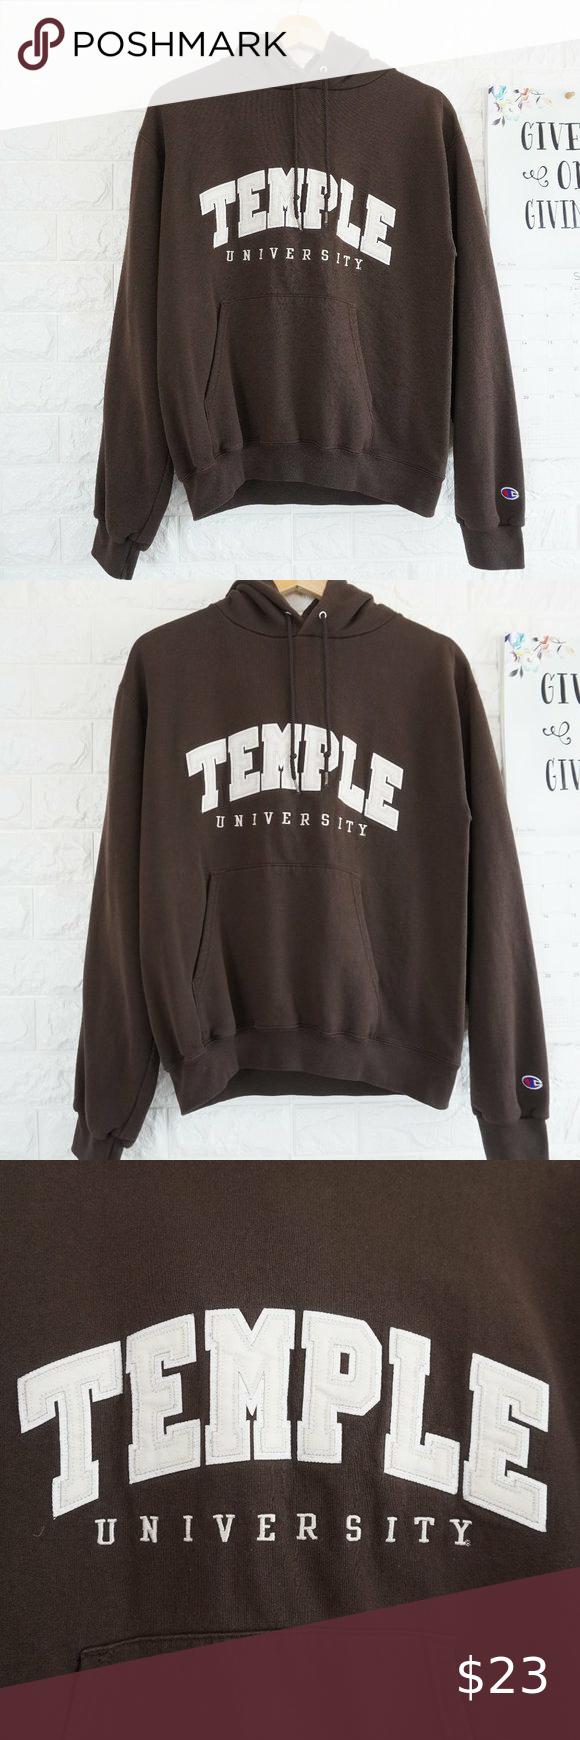 Champion Temple University Sweatshirt Hoodie Sz S Sweatshirts Sweatshirts Hoodie University Sweatshirts [ 1740 x 580 Pixel ]